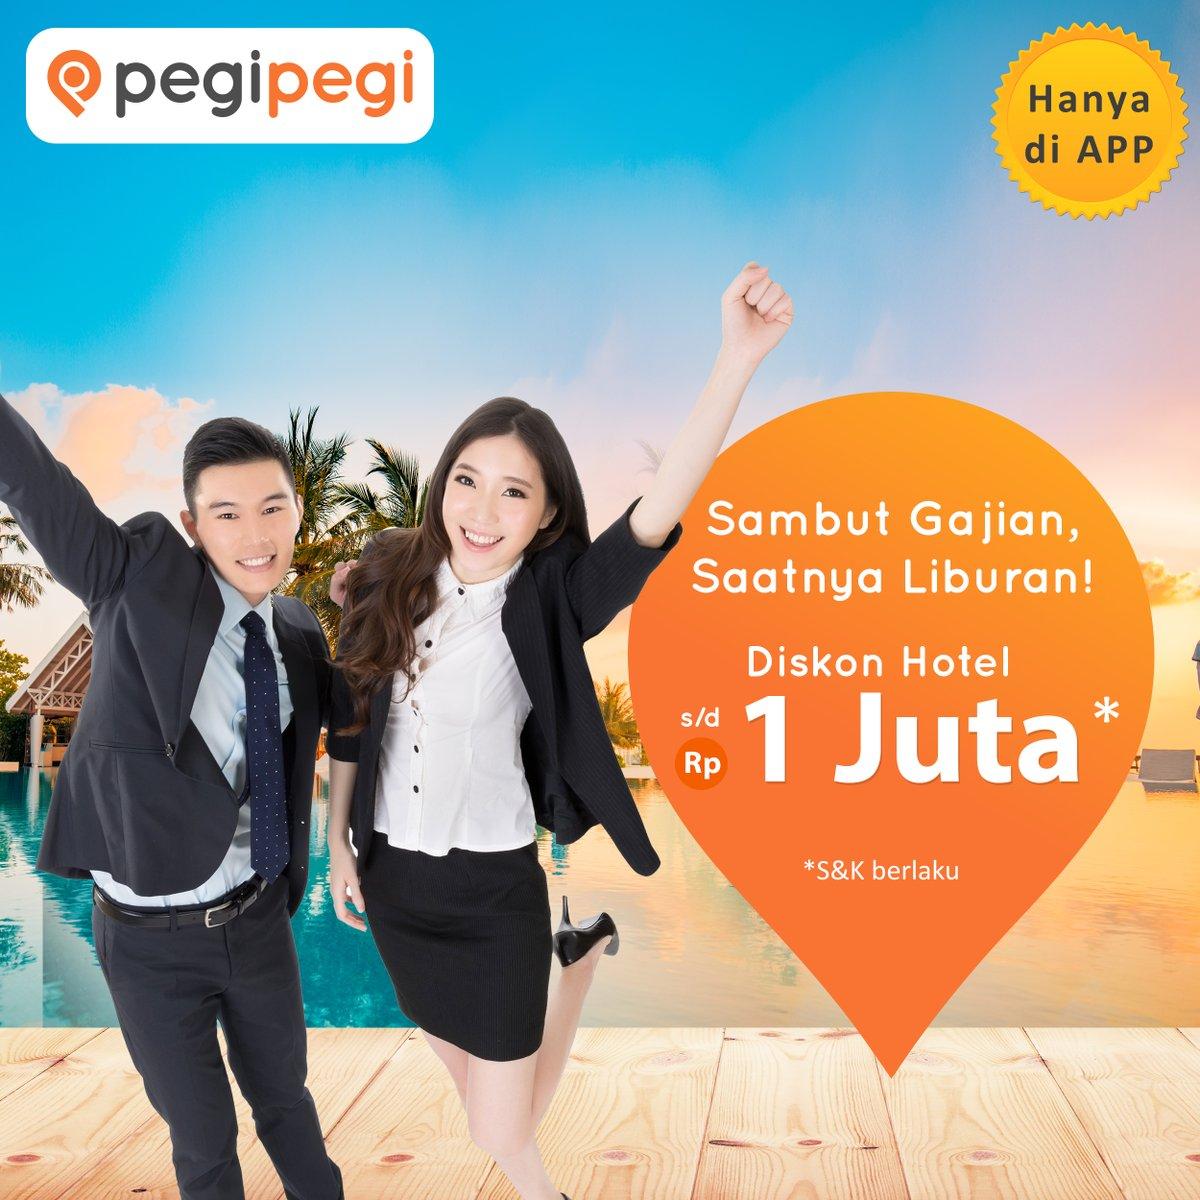 PegiPegi - Voucher Promo Gajian Diskon Hotel s.d 1 Juta (s.d 5 Agustus 2018)